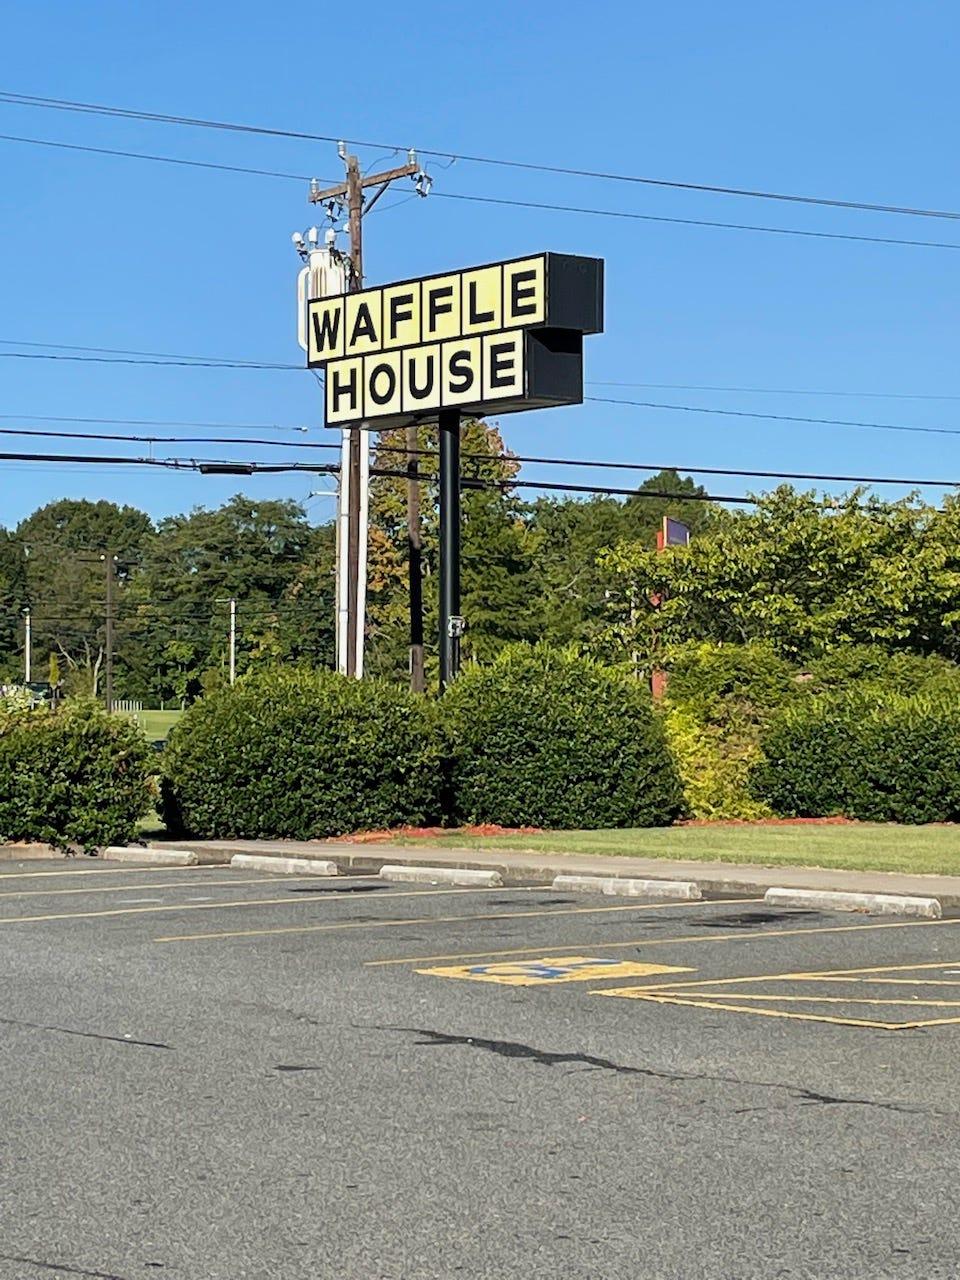 Waffle House parking lot